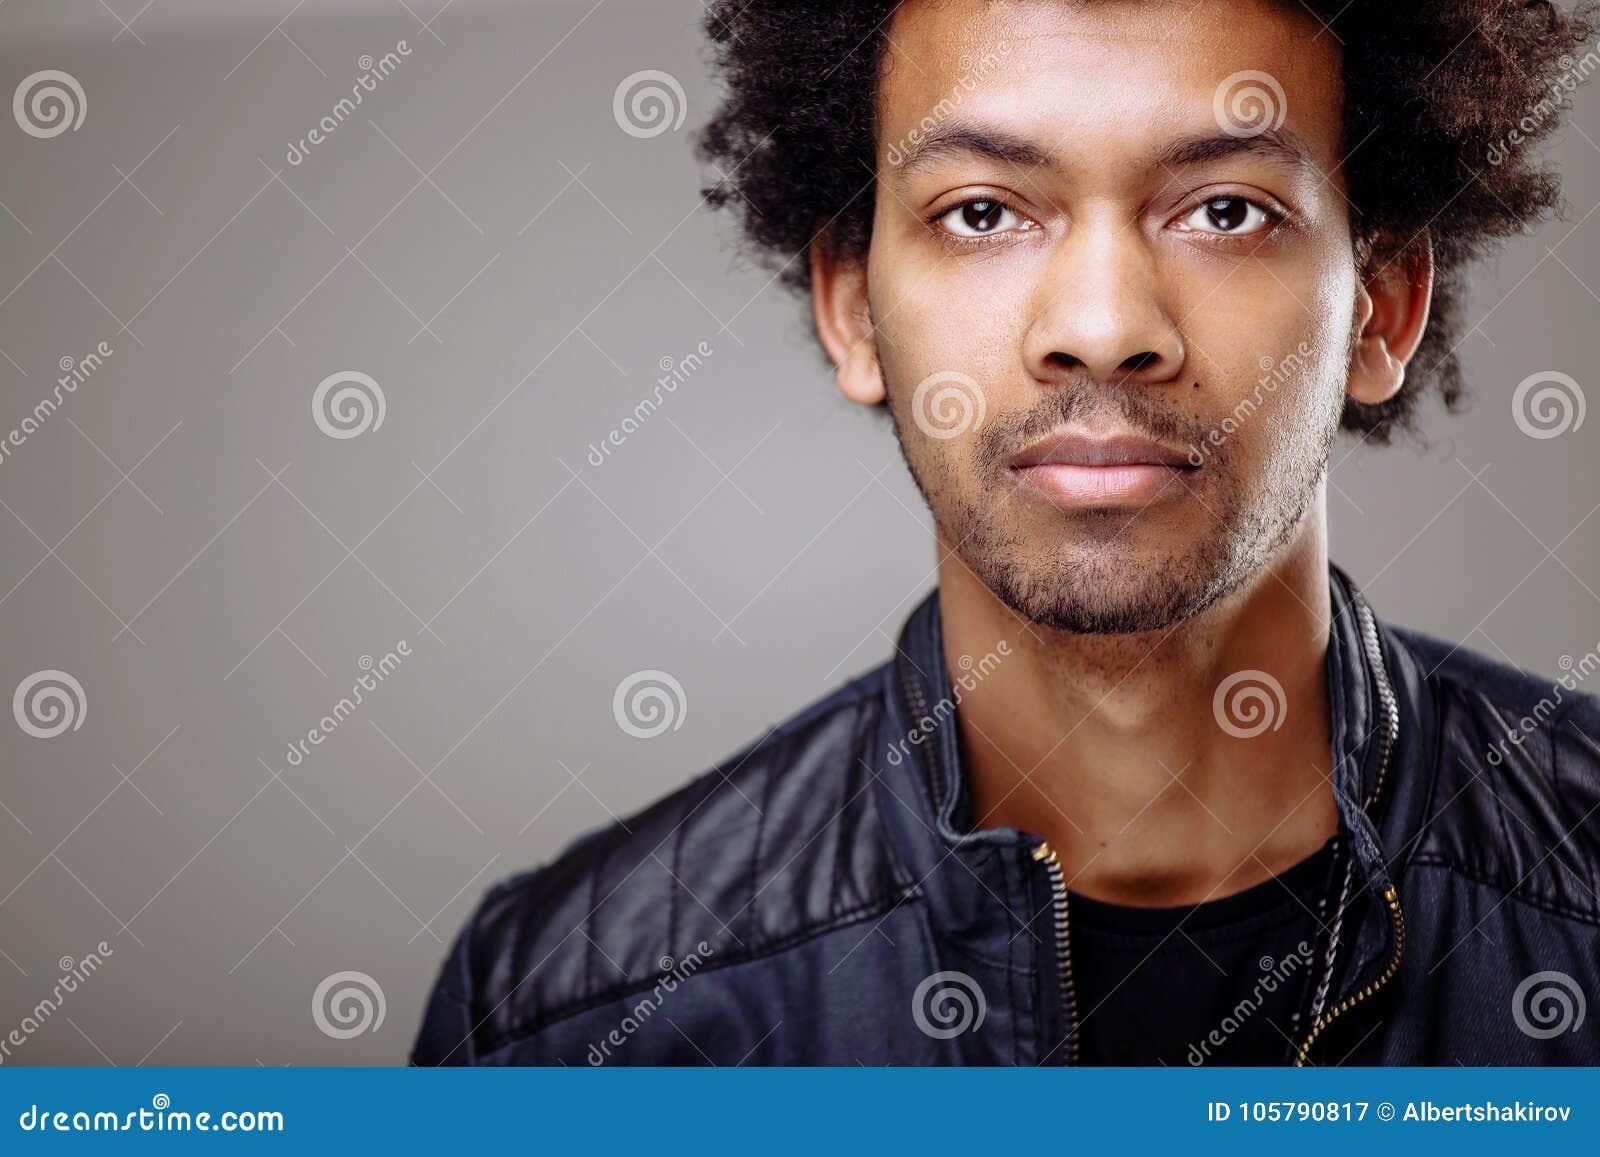 Man With Bushy Curly Hair Blinking His Eye Having Warm Broad Smile